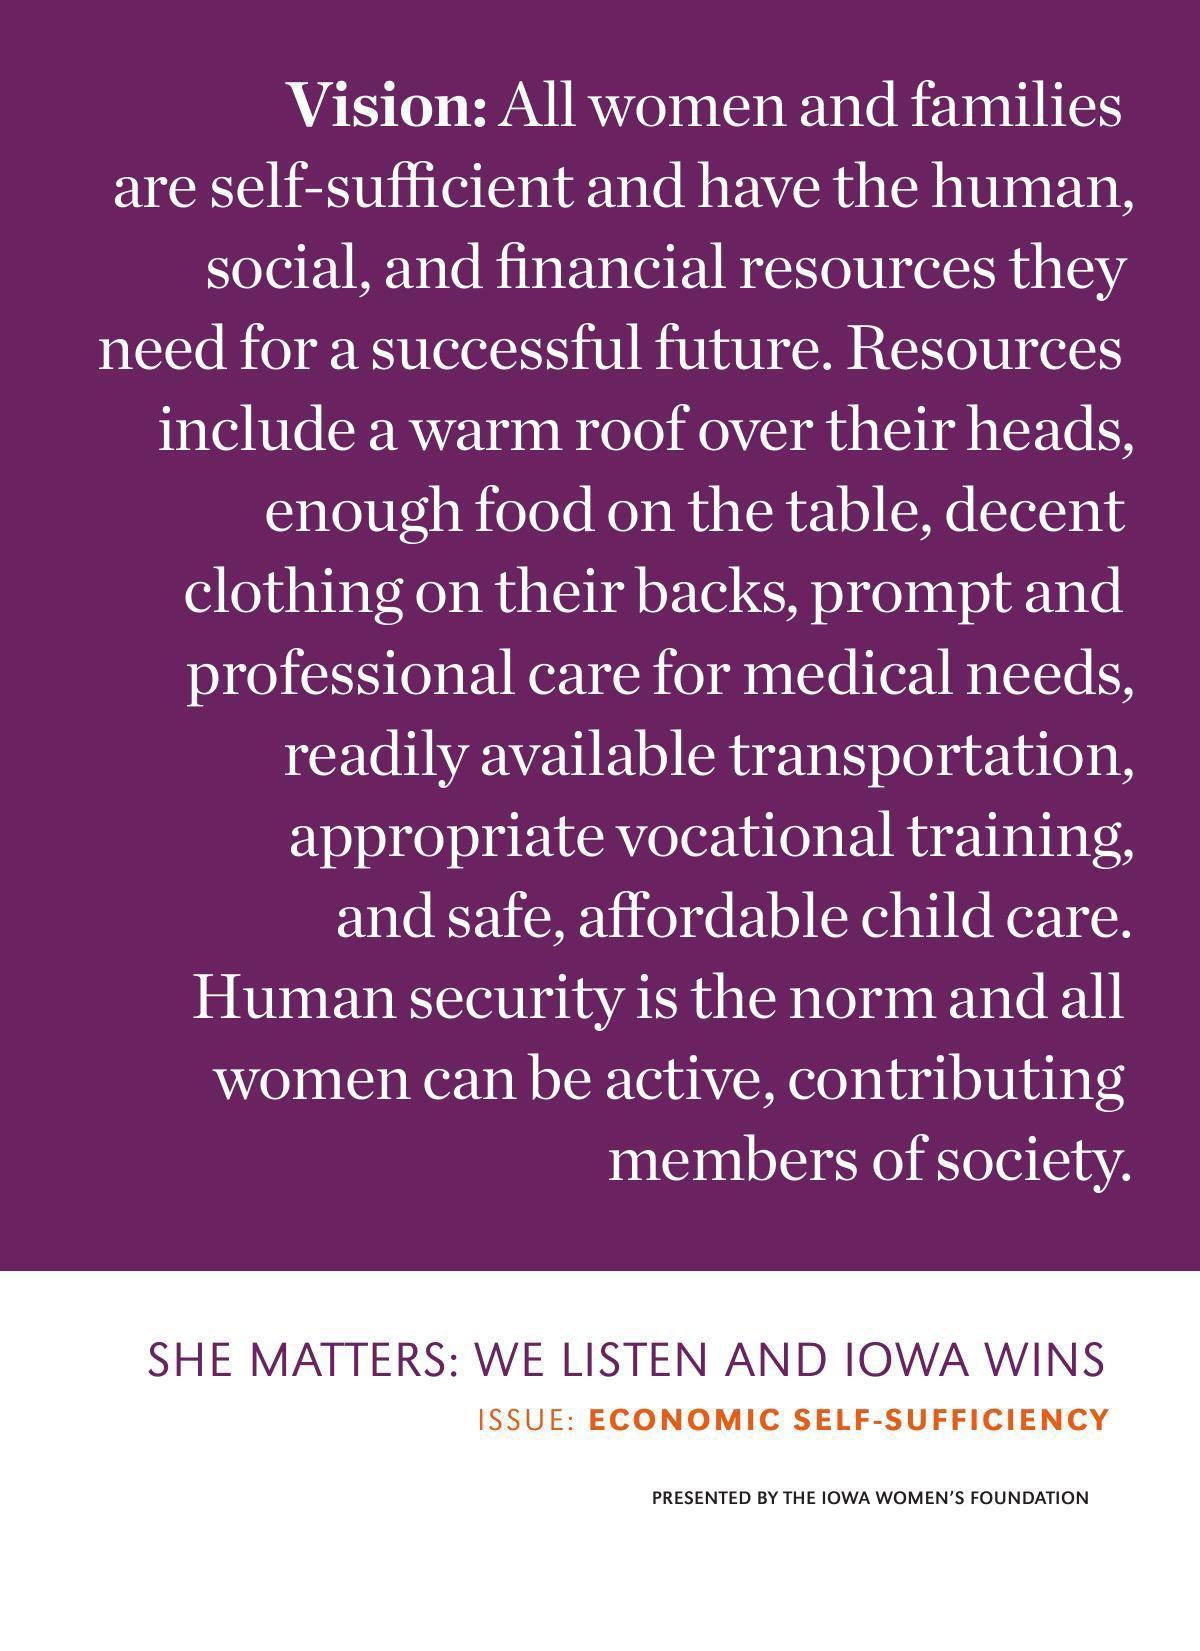 PDF: Iowa Women's Foundation economic report